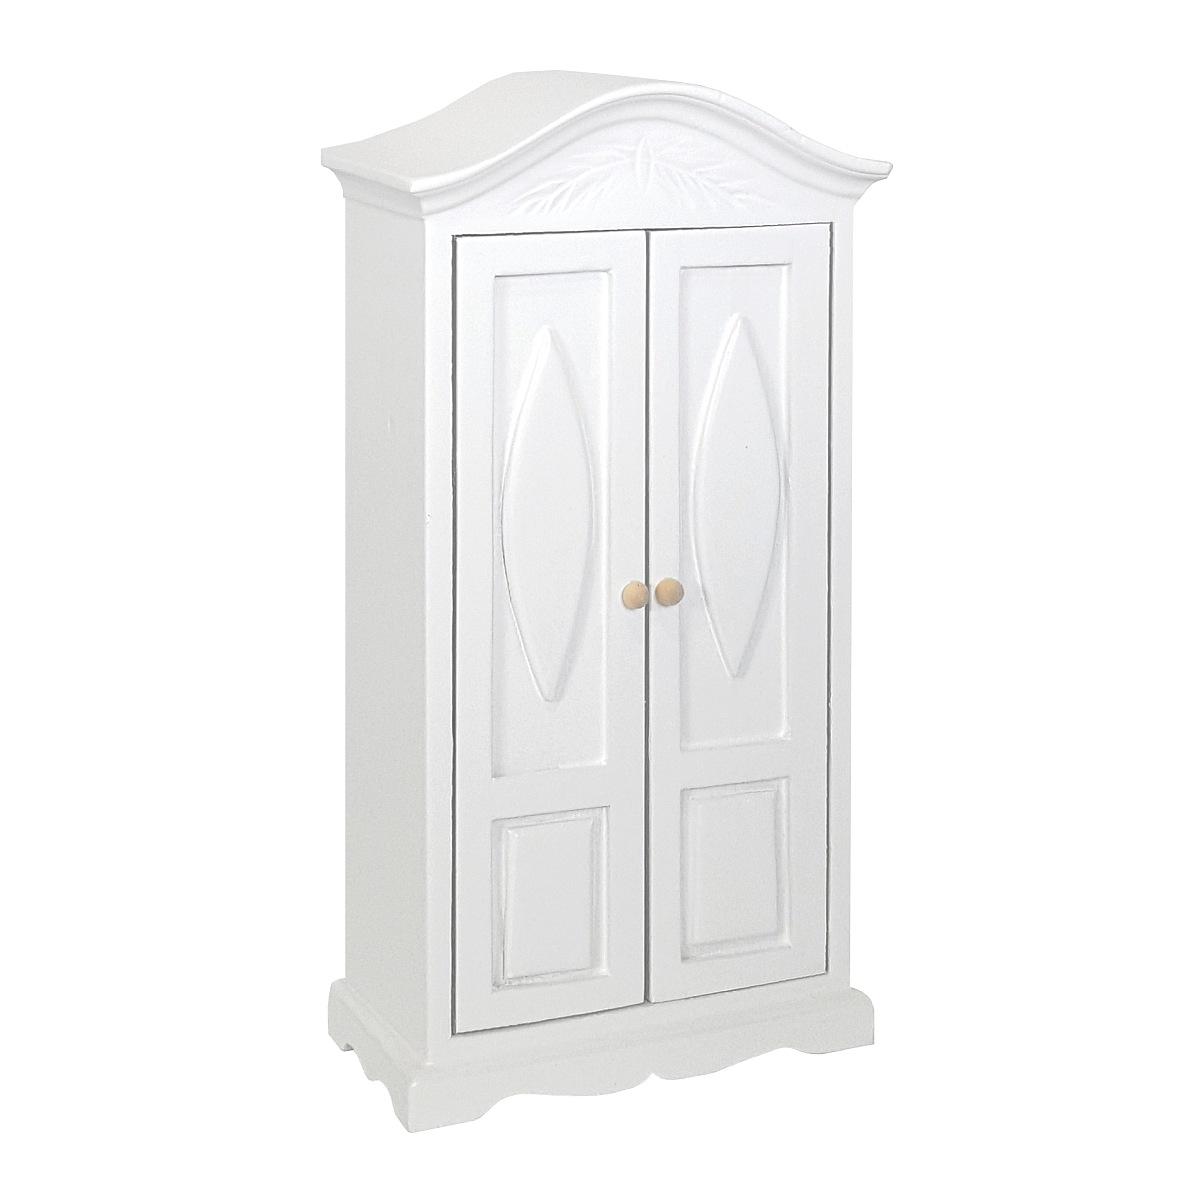 Linen cupboard, white 完成品・リネンクローゼット